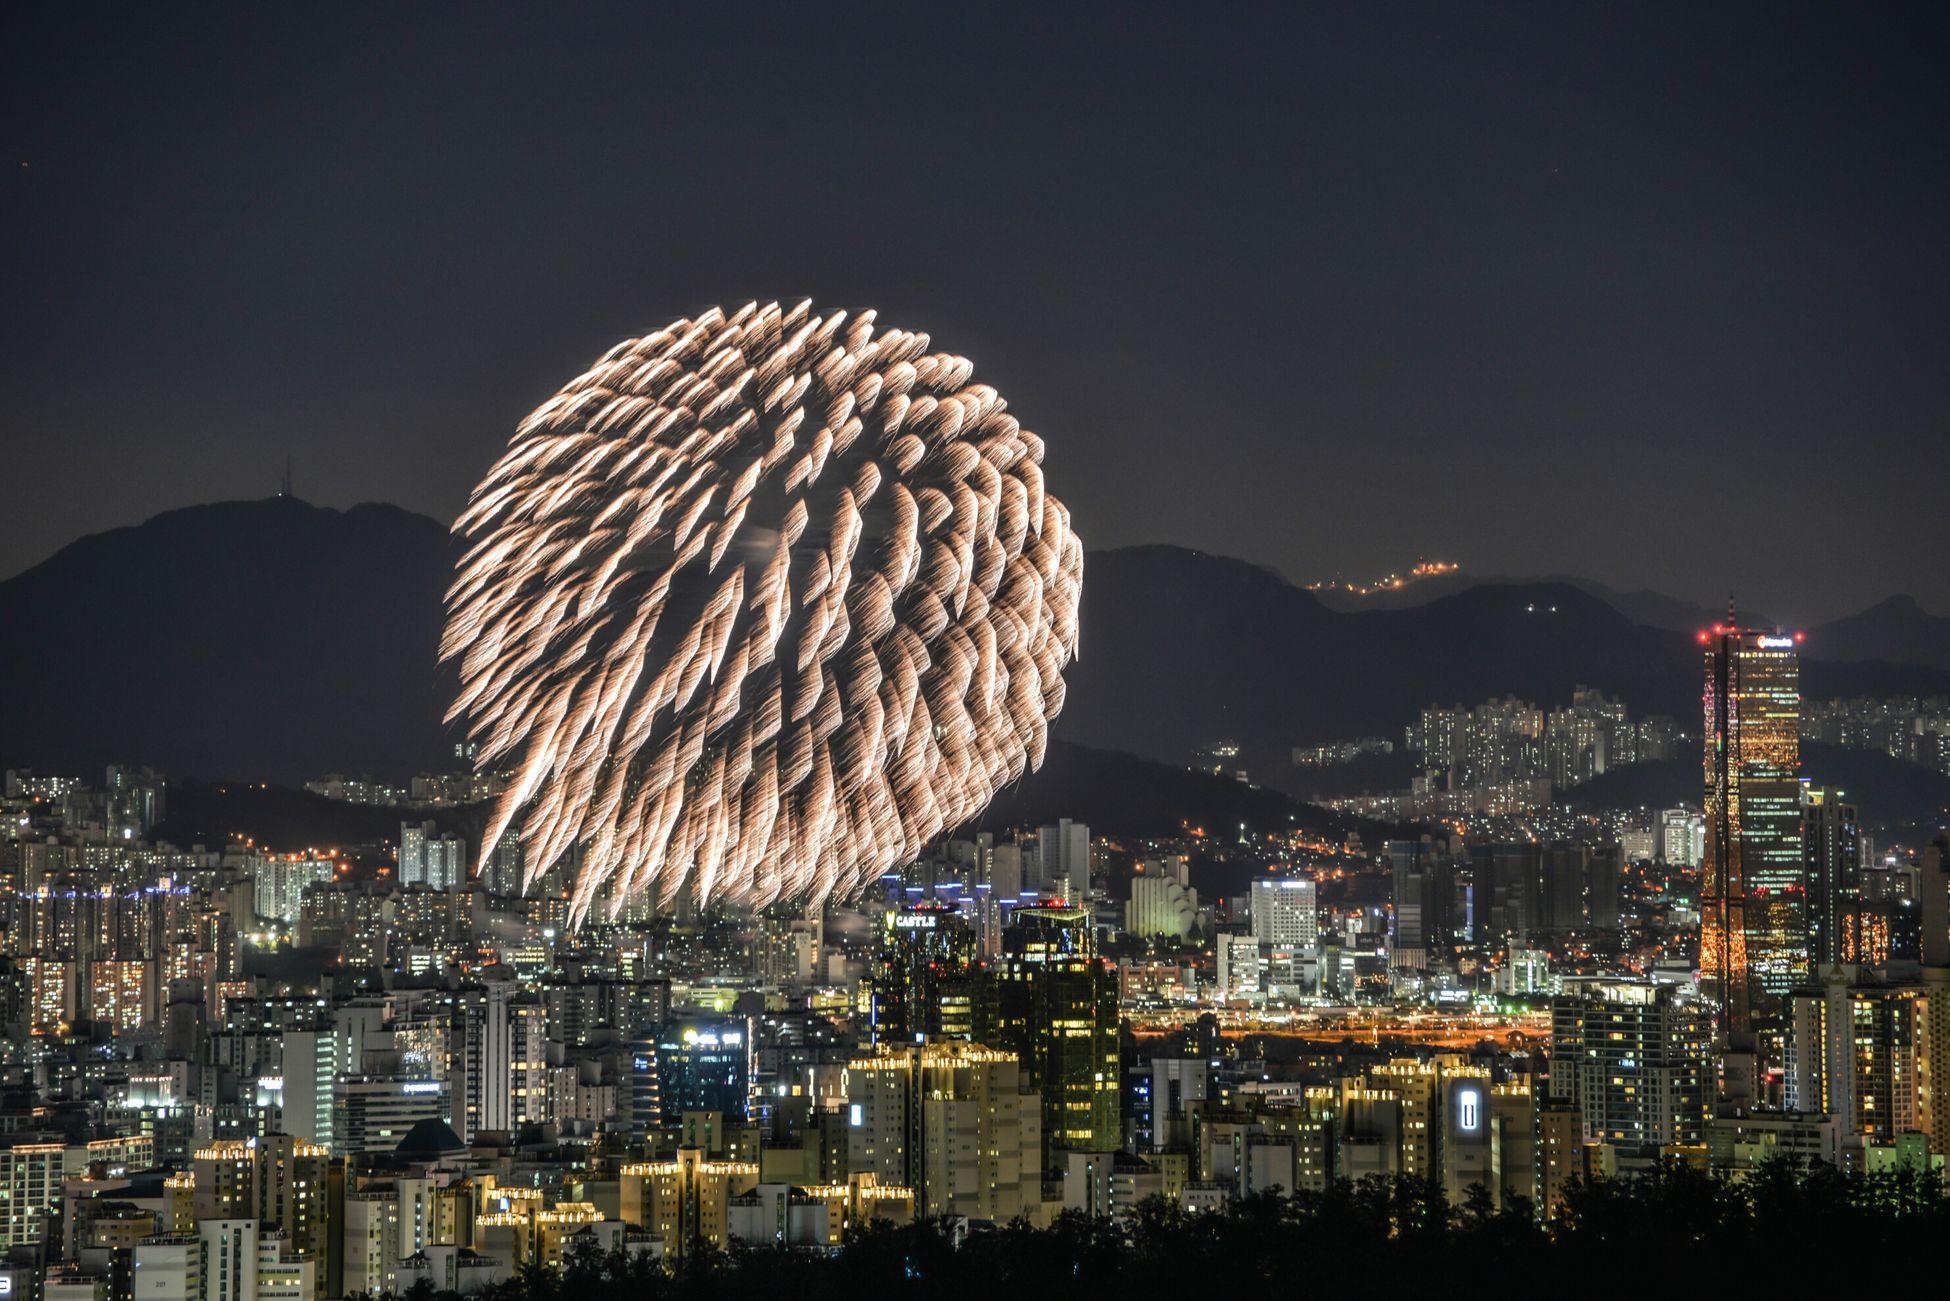 Nikon D610 Seoul_korea Night View 70300vr Long Exposure Fireworks Scenery Photo Trajectory